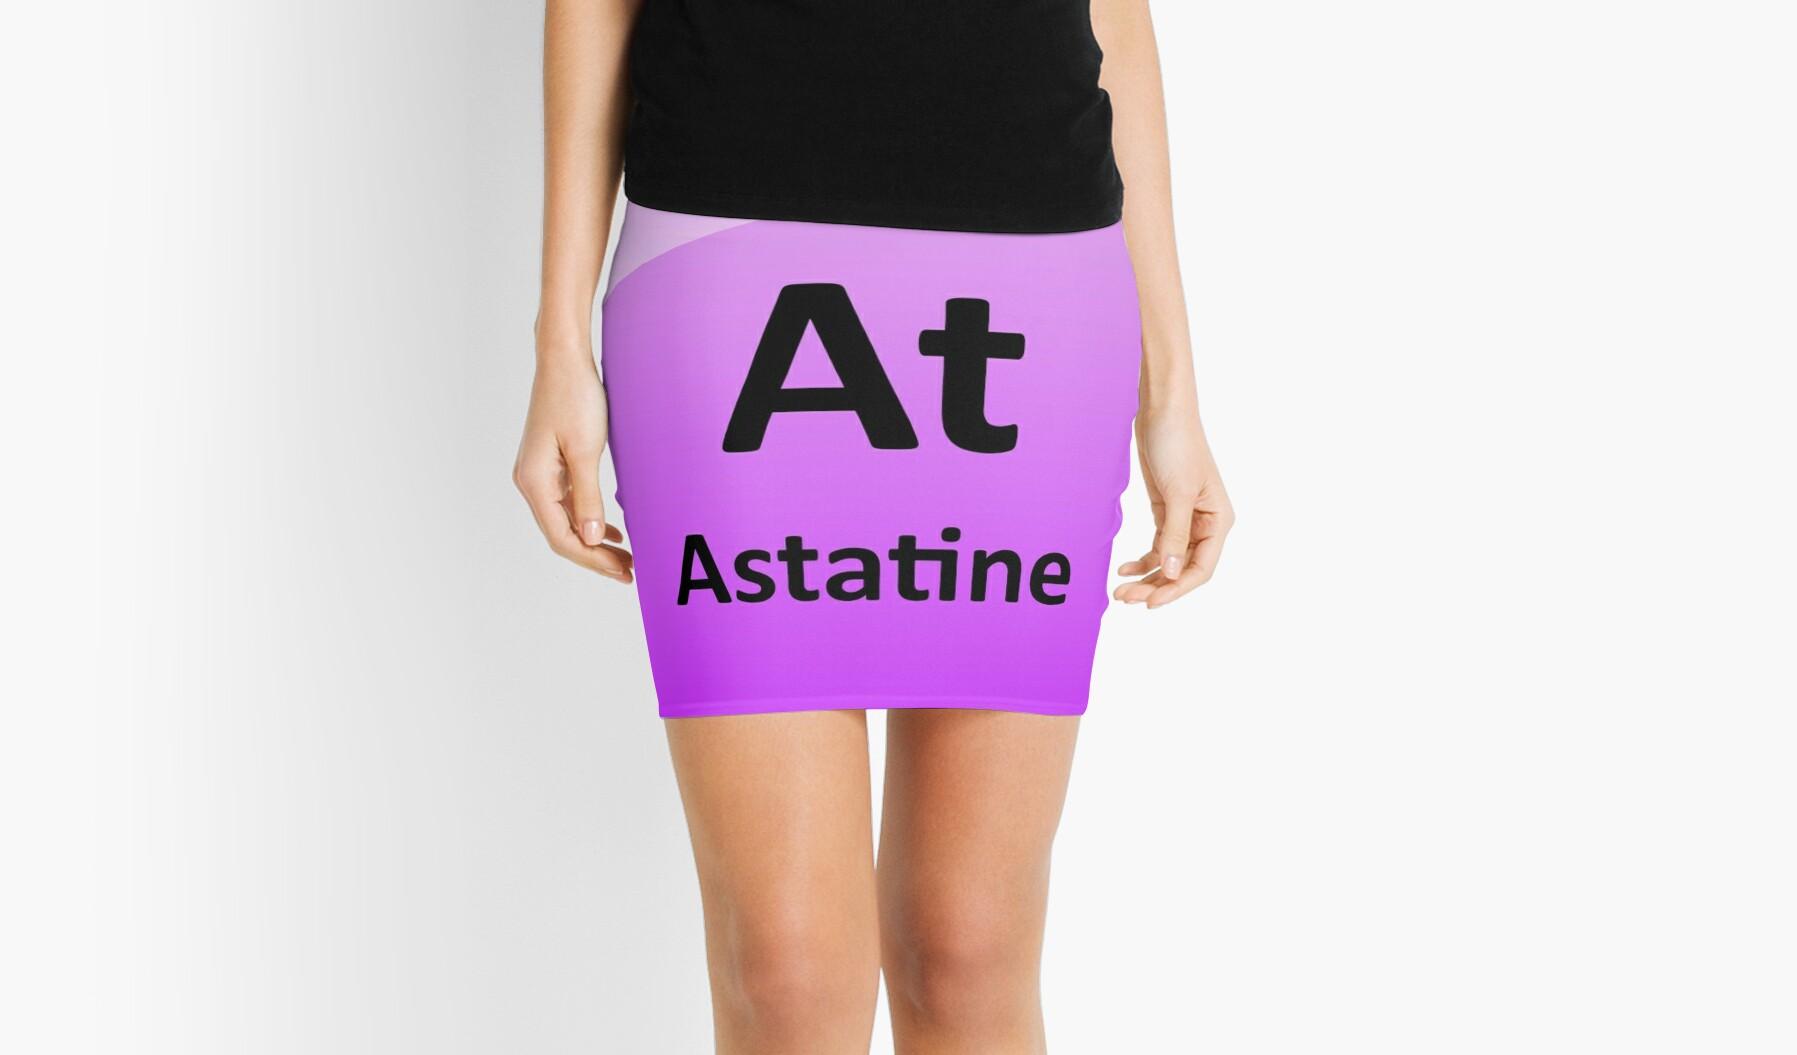 Astatine periodic table element symbol mini skirts by astatine periodic table element symbol gamestrikefo Image collections